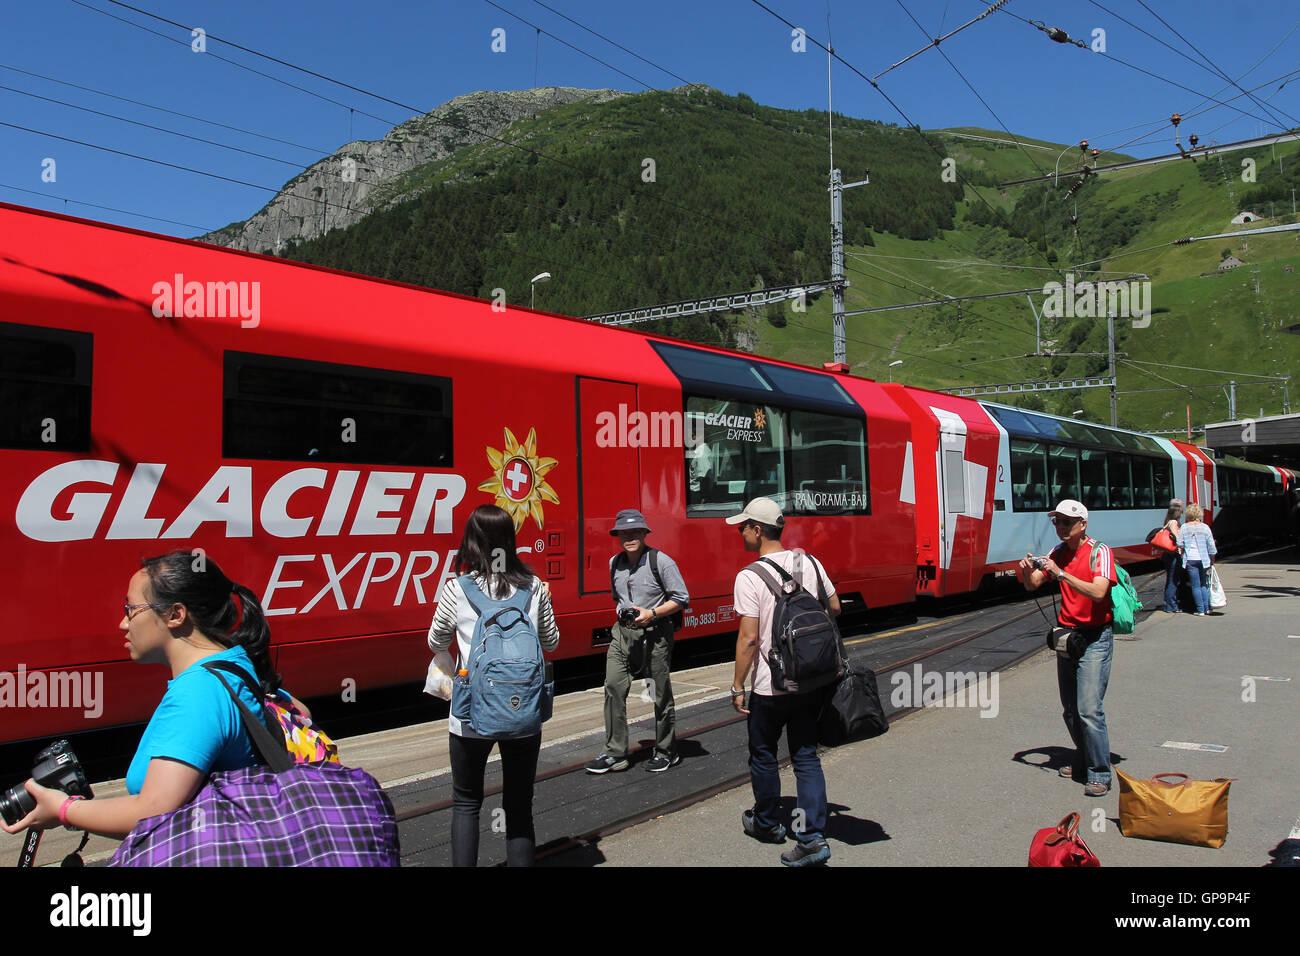 Glacier Express in station, Switzerland - Stock Image